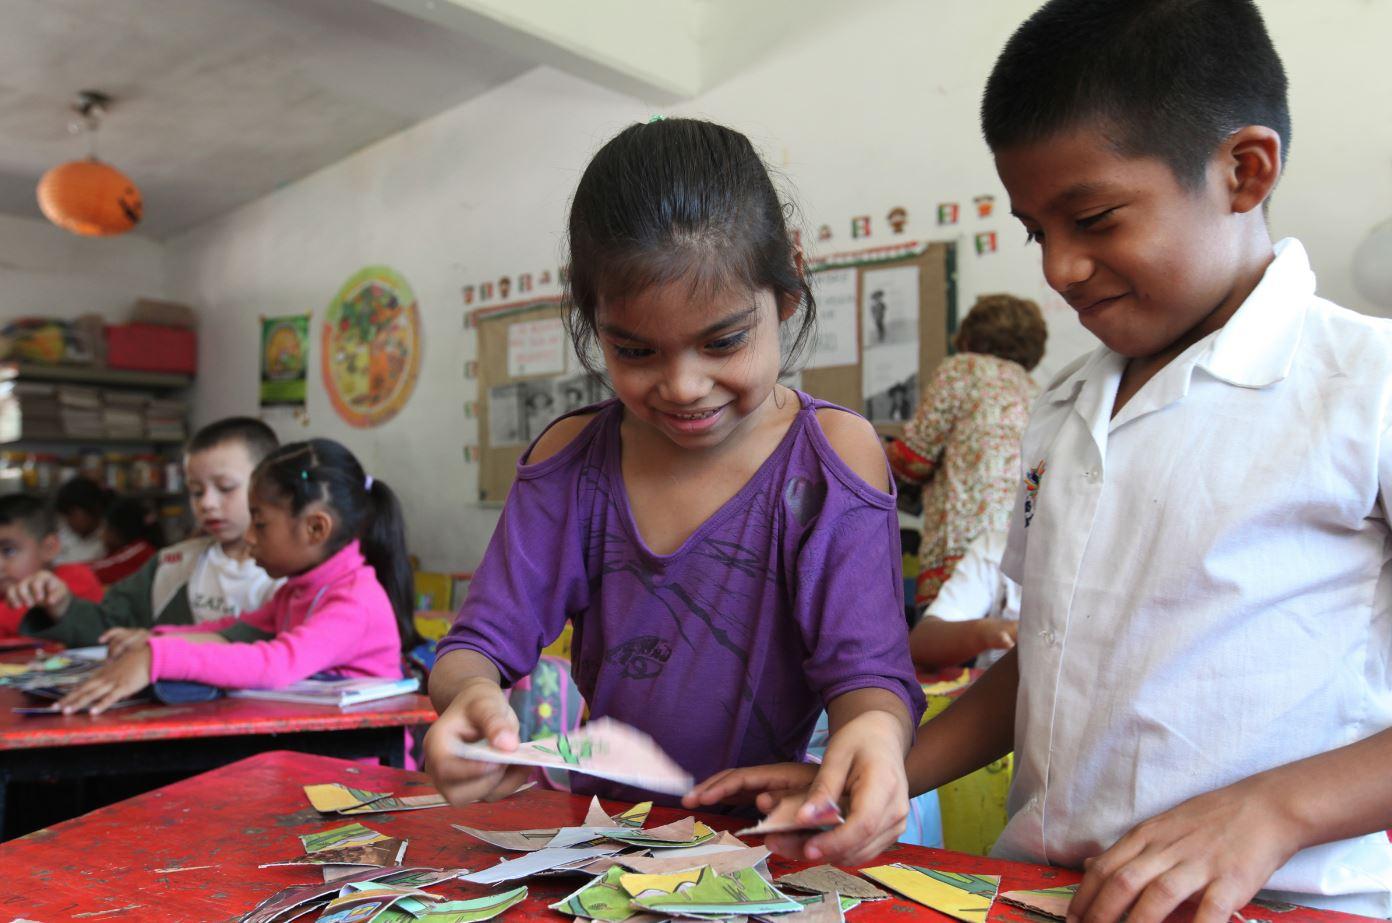 Divemex: Culiacán, Mexico | Dafné Jaquelin Jimenez Camilo (left), 7, and Jesus Manuel Camilo Diaz, 9, attempt to solve a jigsaw puzzle during their second grade class at Benito Juarez Elementary School.